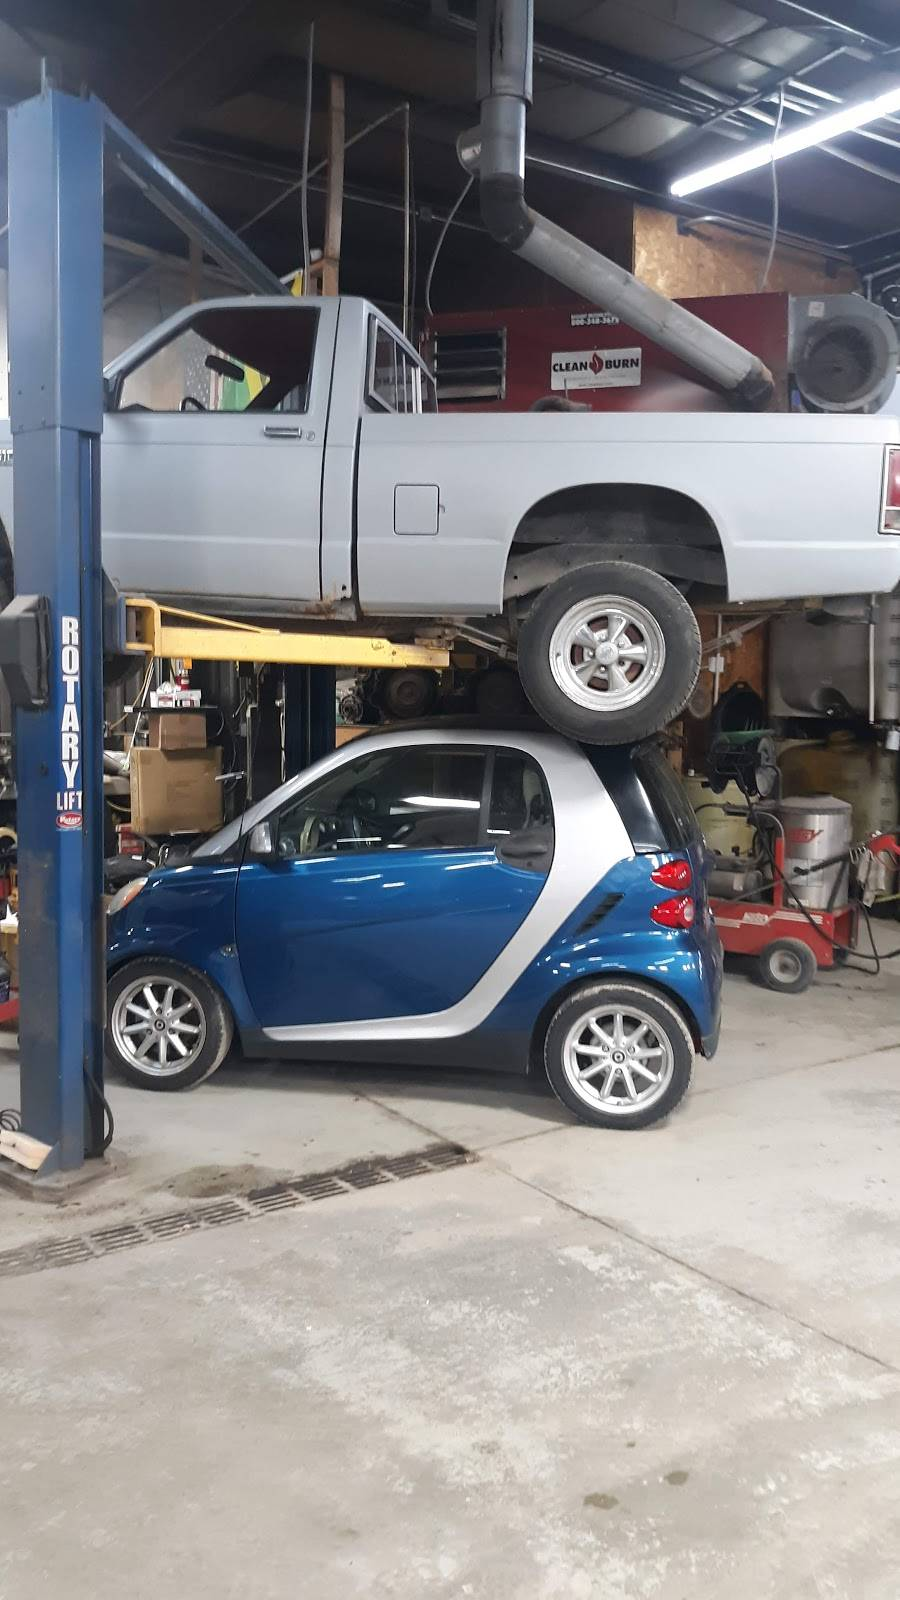 Troys Automotive - car repair  | Photo 3 of 3 | Address: 1329 Dawes Ave, Lincoln, NE 68521, USA | Phone: (402) 477-7182